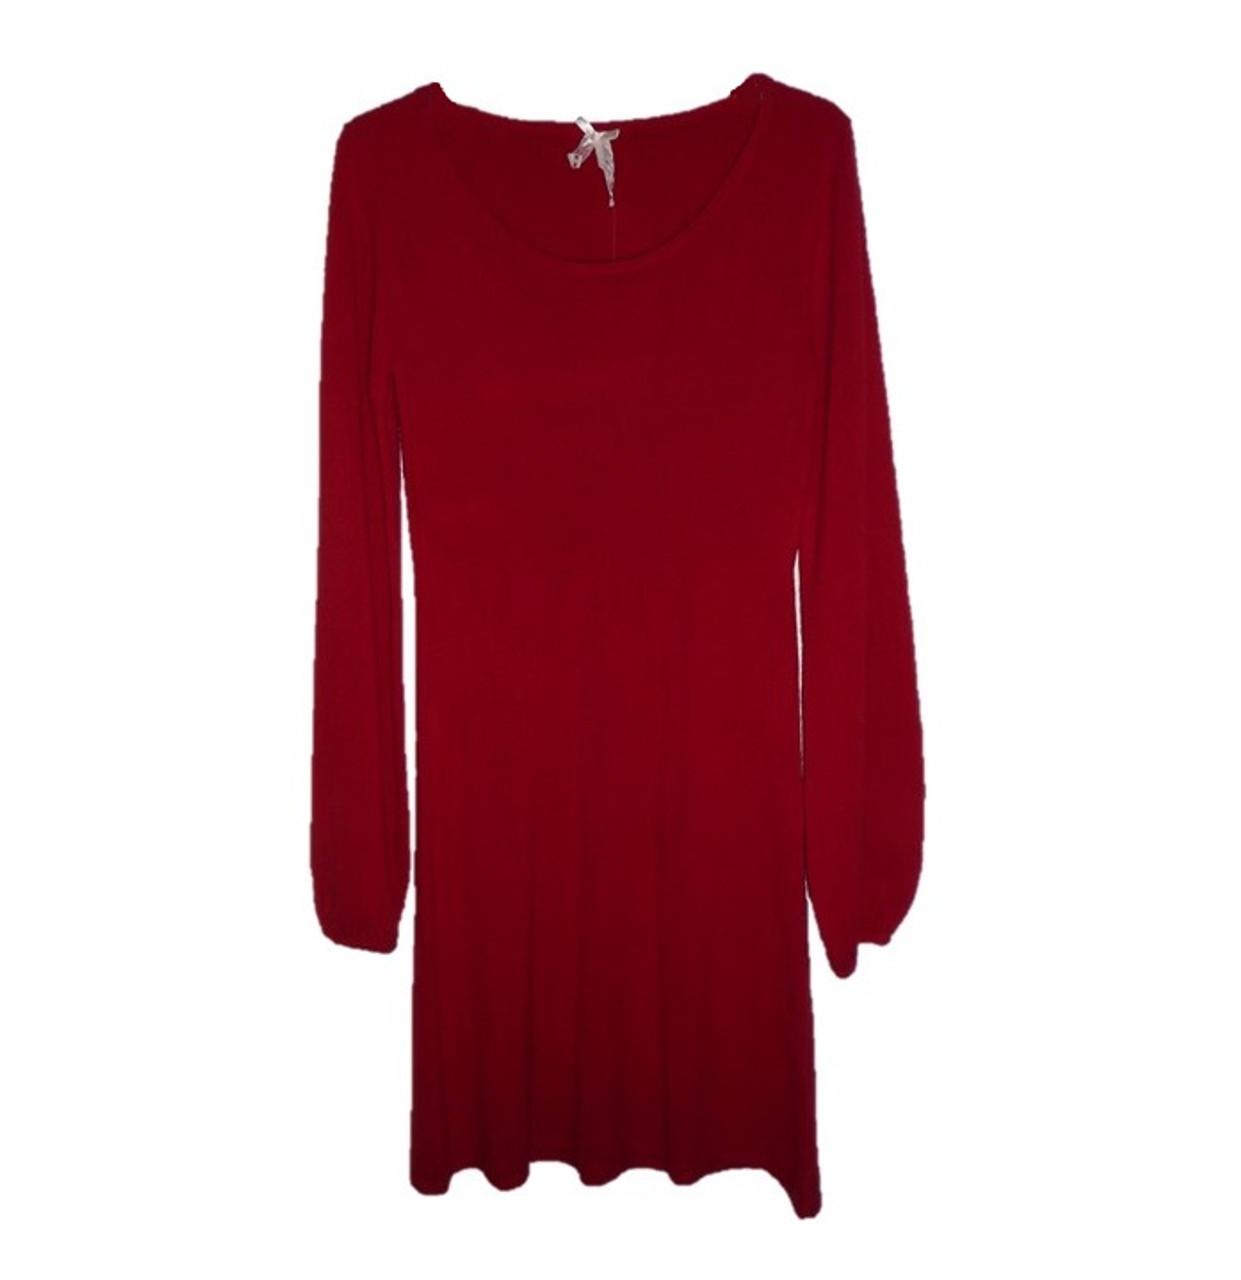 Womens Knit Dress Long Sleeve Red Sweater Dress